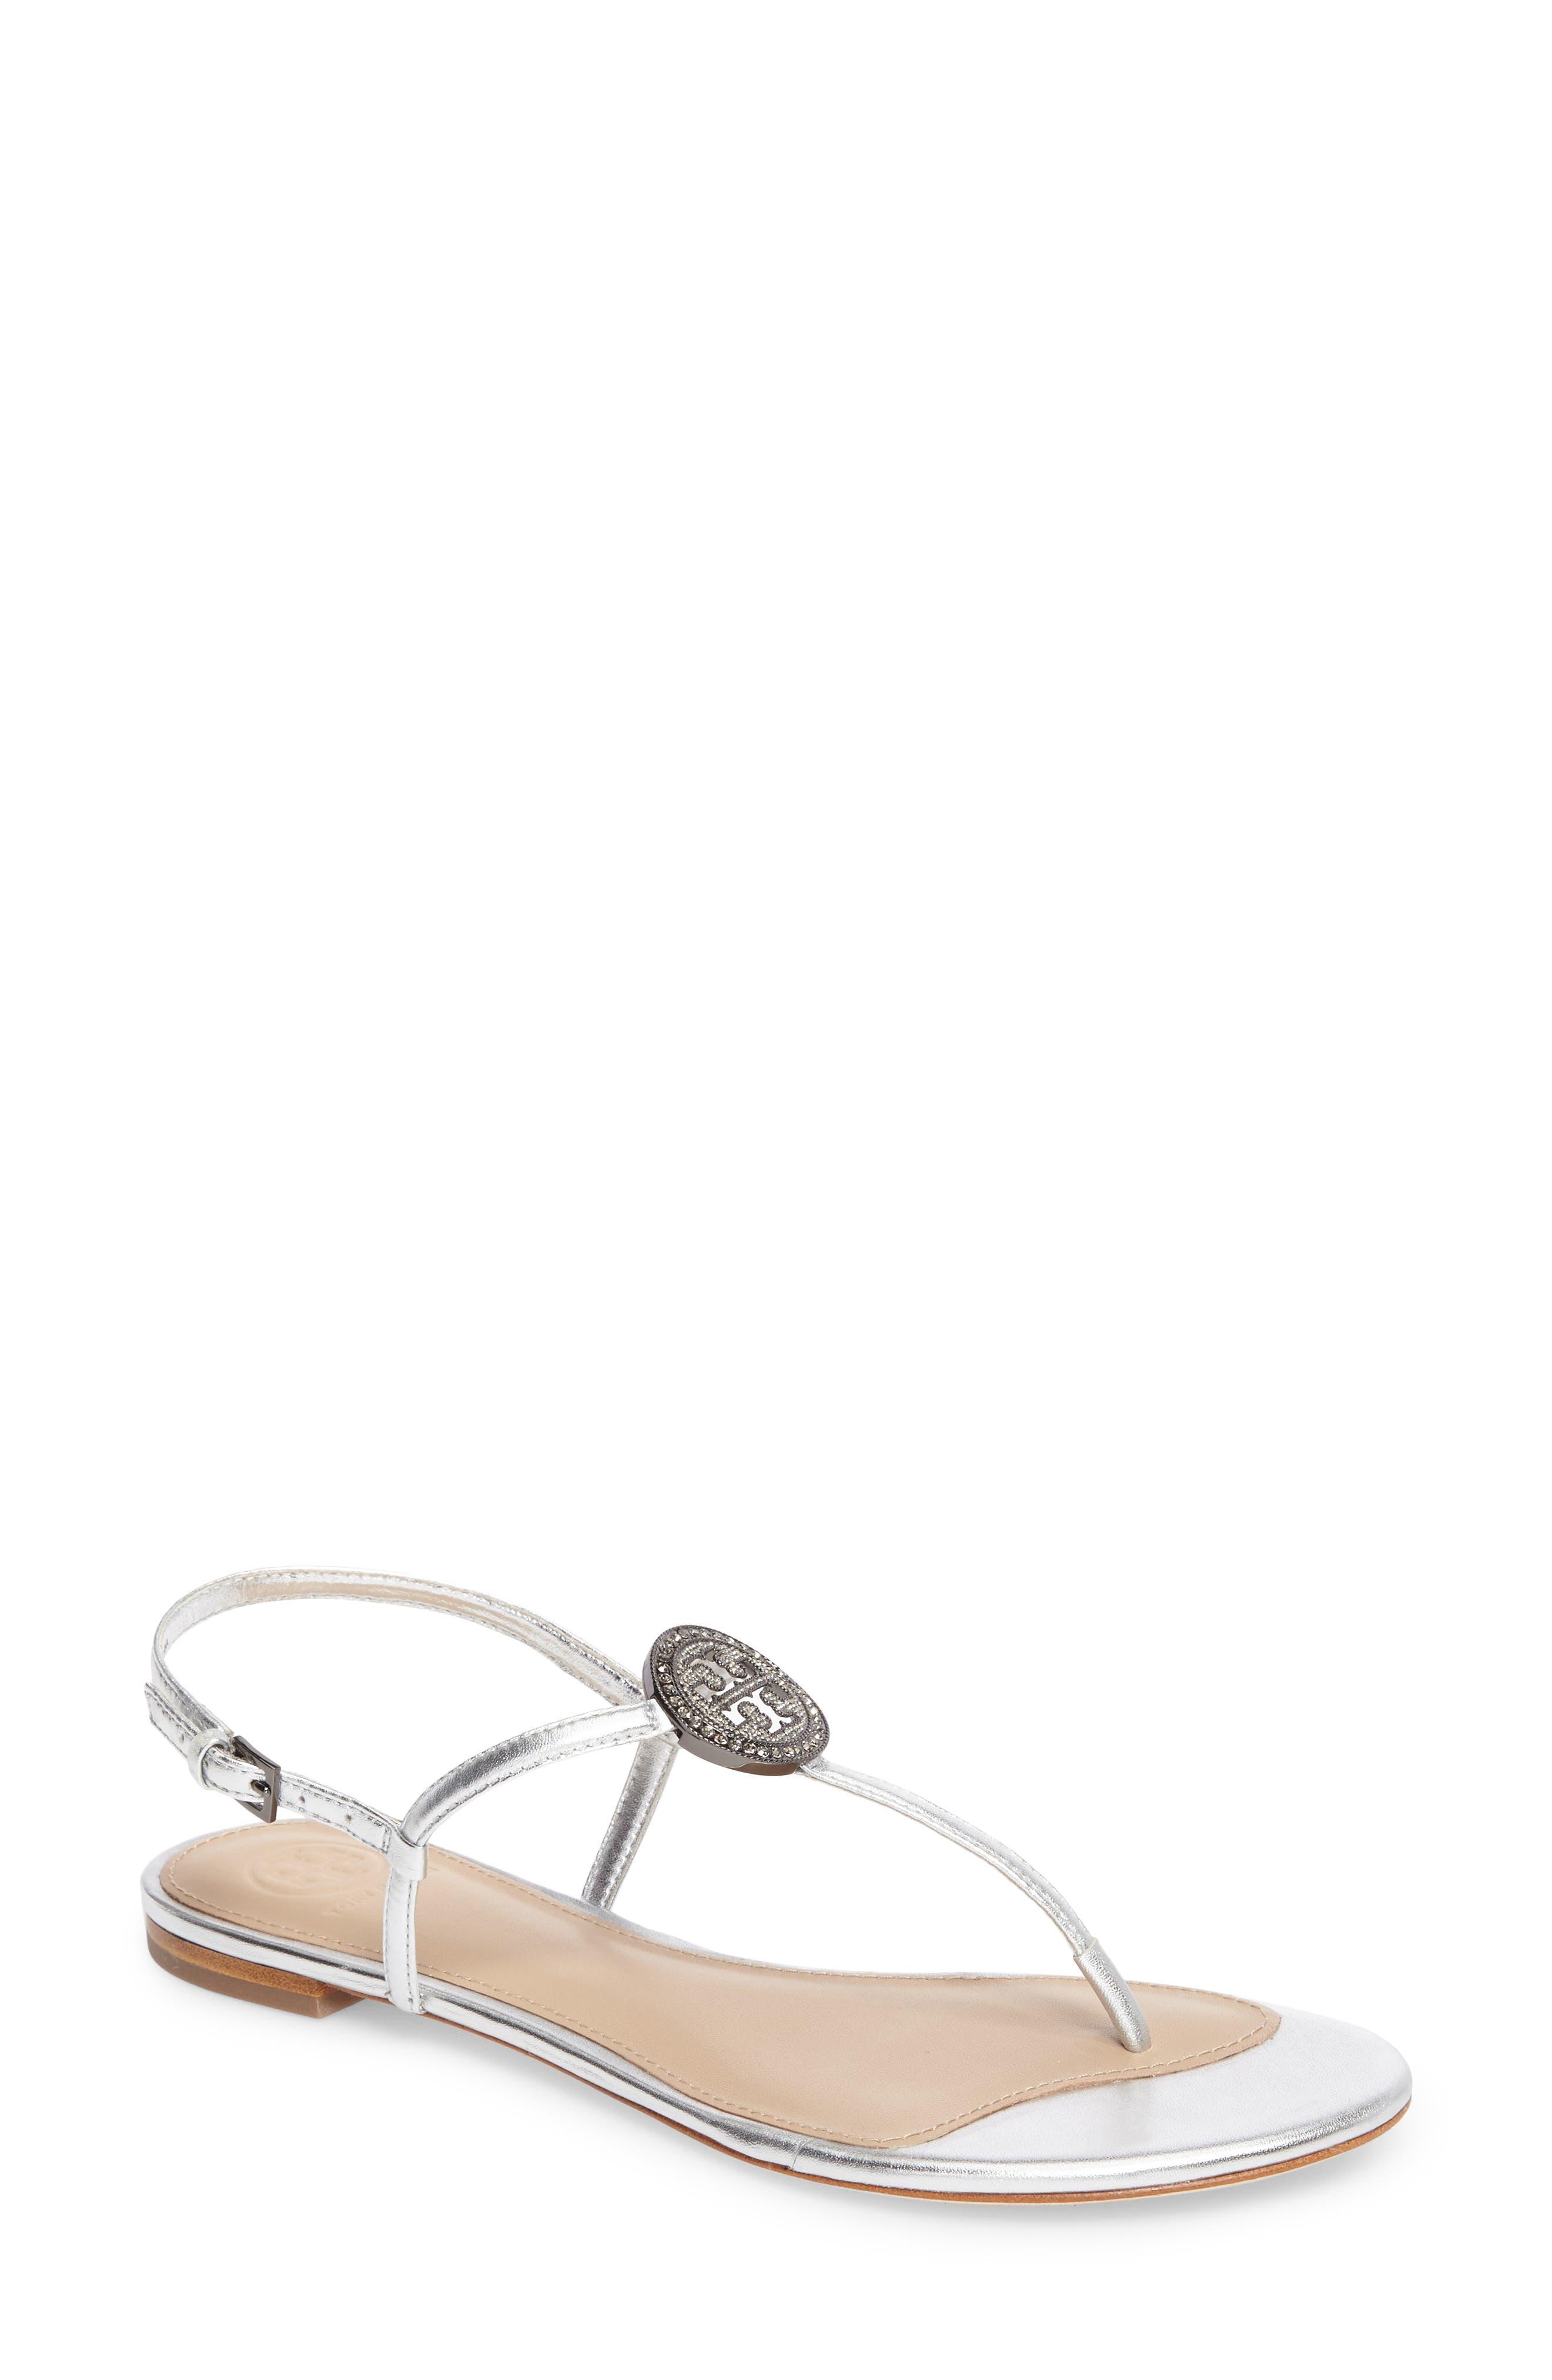 Liana Sandal,                         Main,                         color, Silver